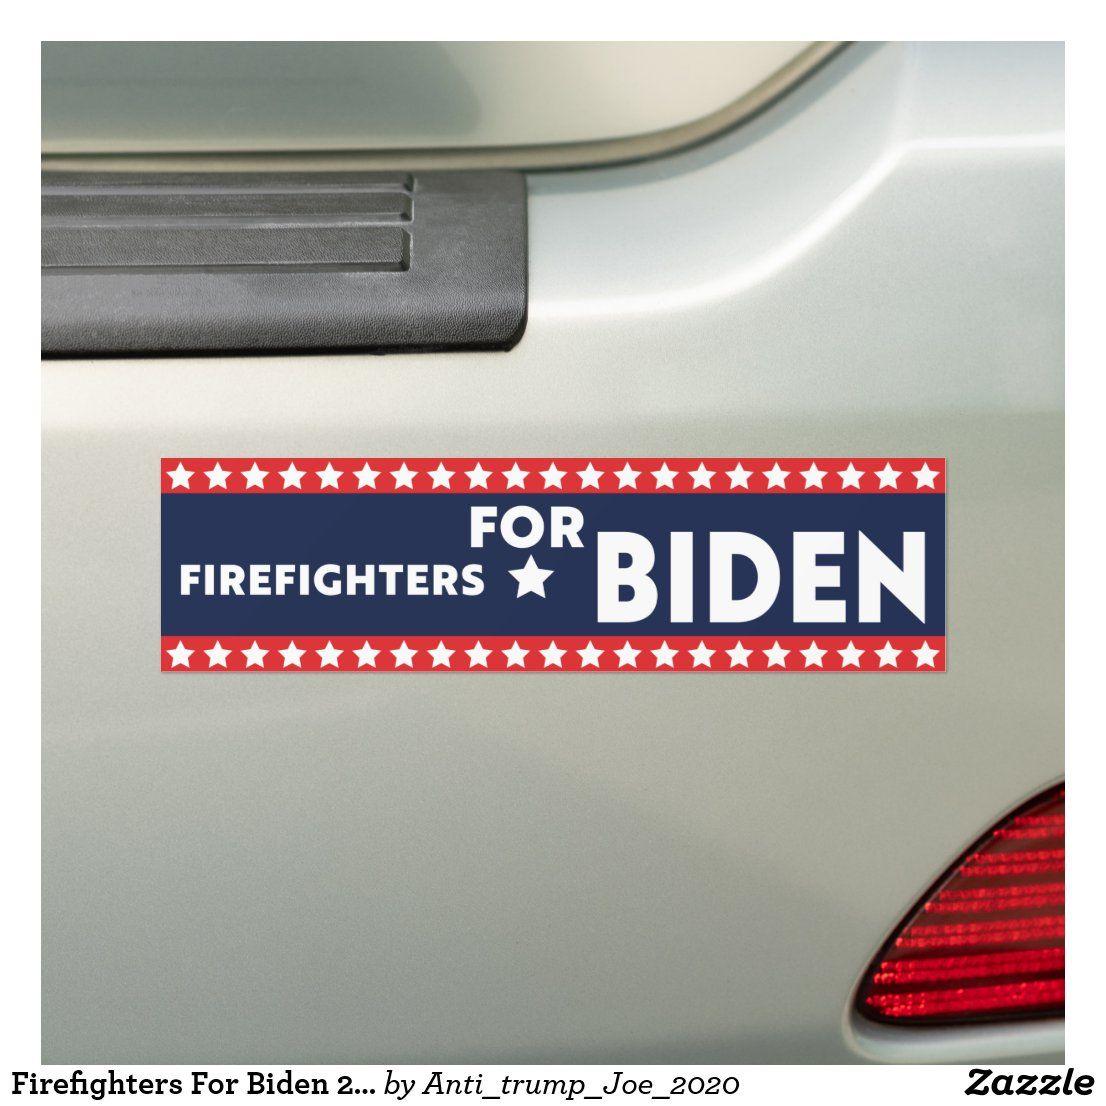 Firefighters For Biden 2020 Biden 2020 Election Bumper Sticker Bumper Stickers Bumpers Firefighter [ 1106 x 1106 Pixel ]